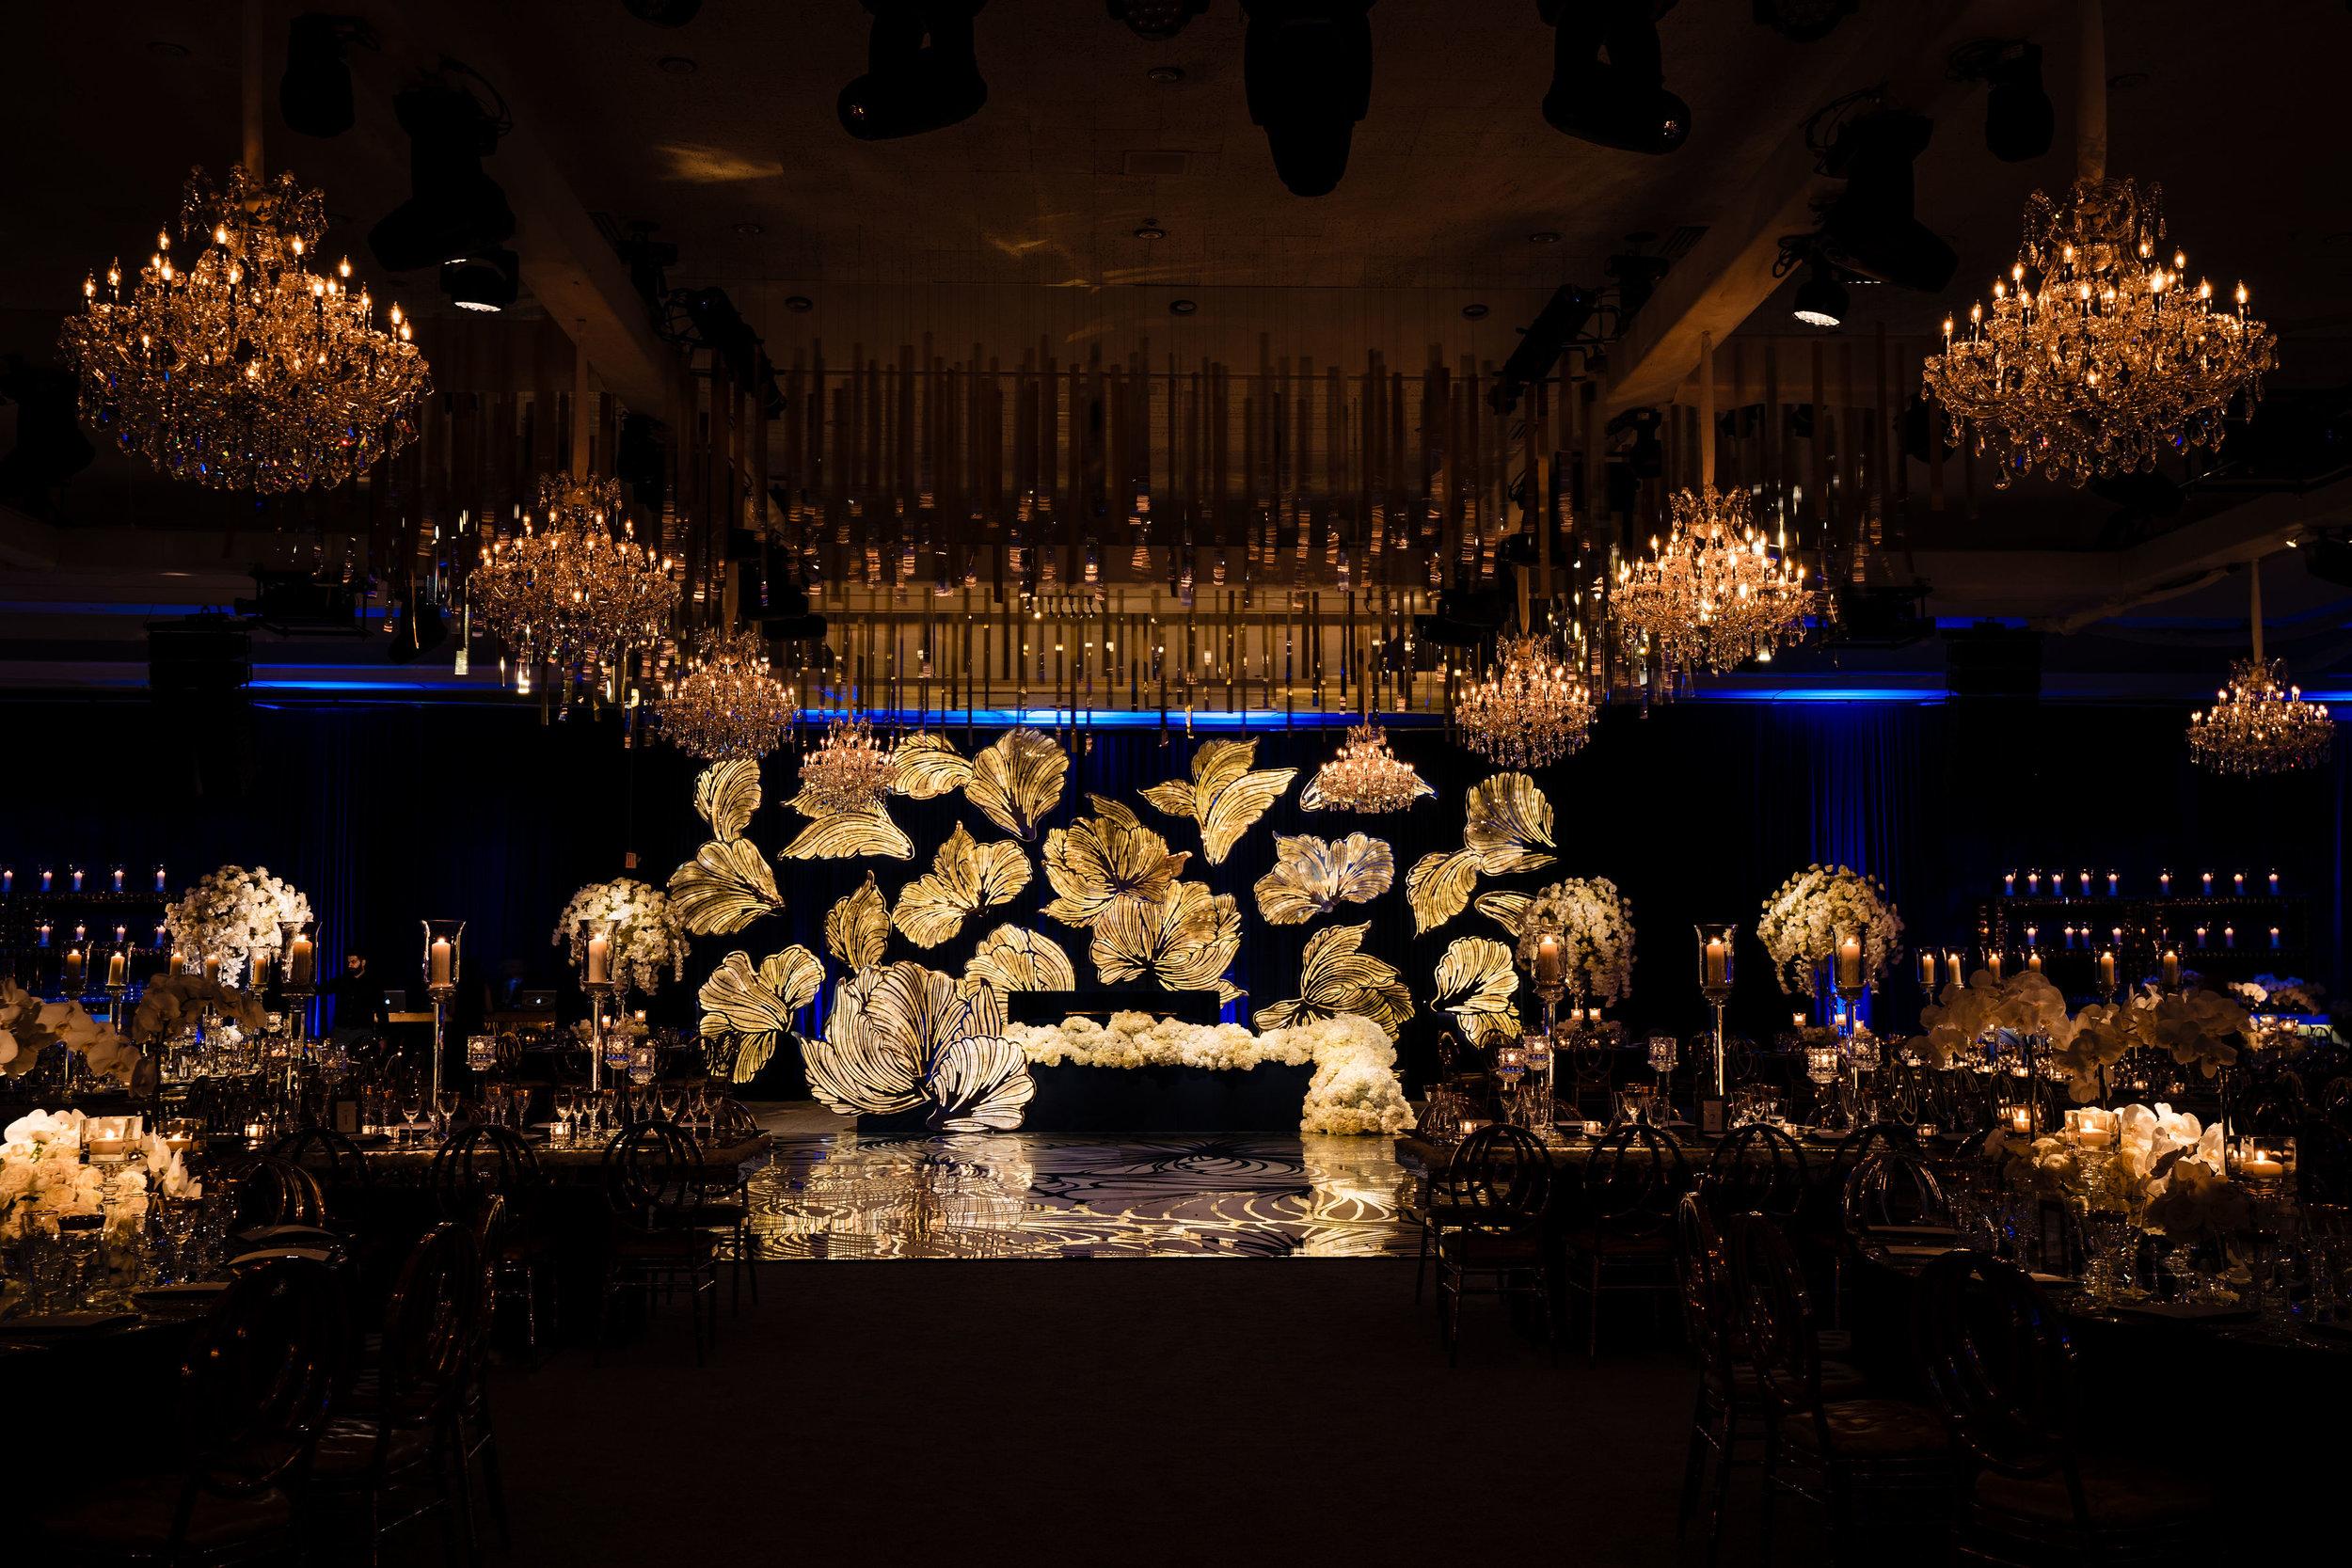 INDIAN WEDDING RECEPTION DECOR 4.JPG